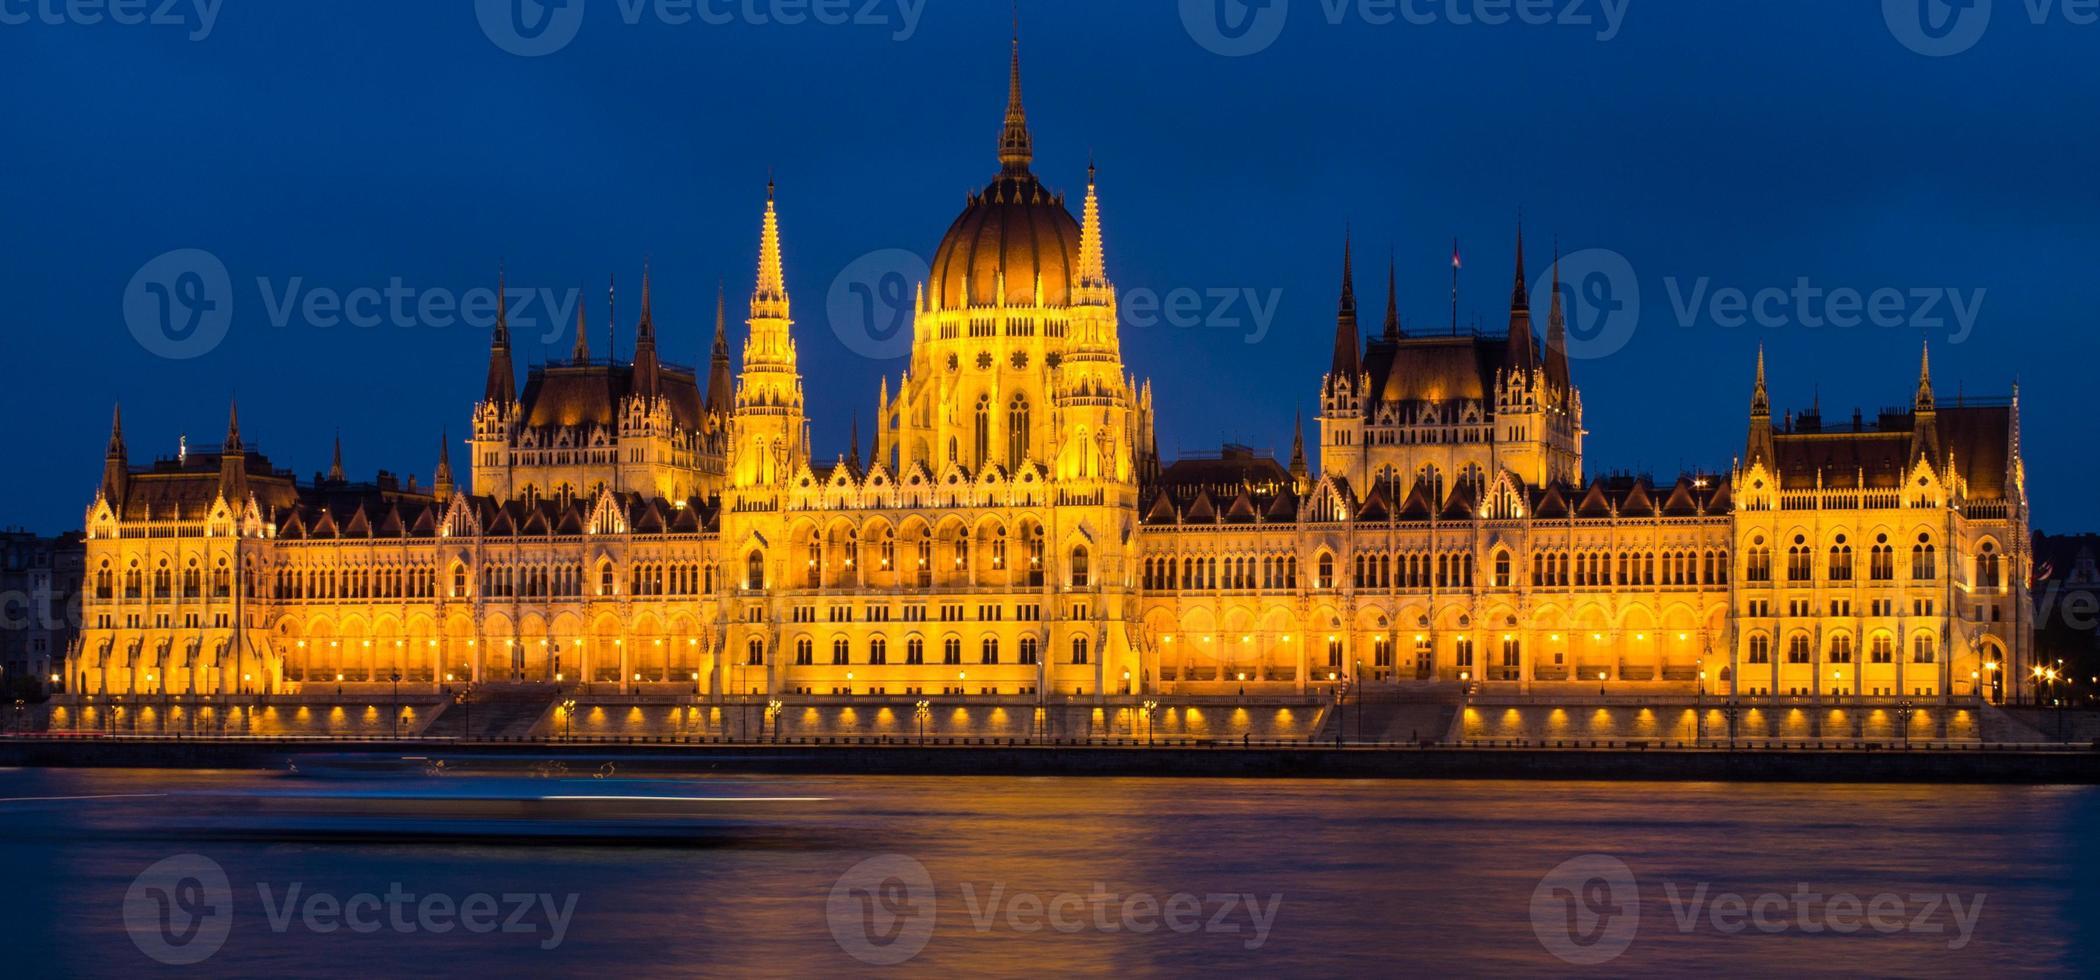 Parlamentsgebäude foto